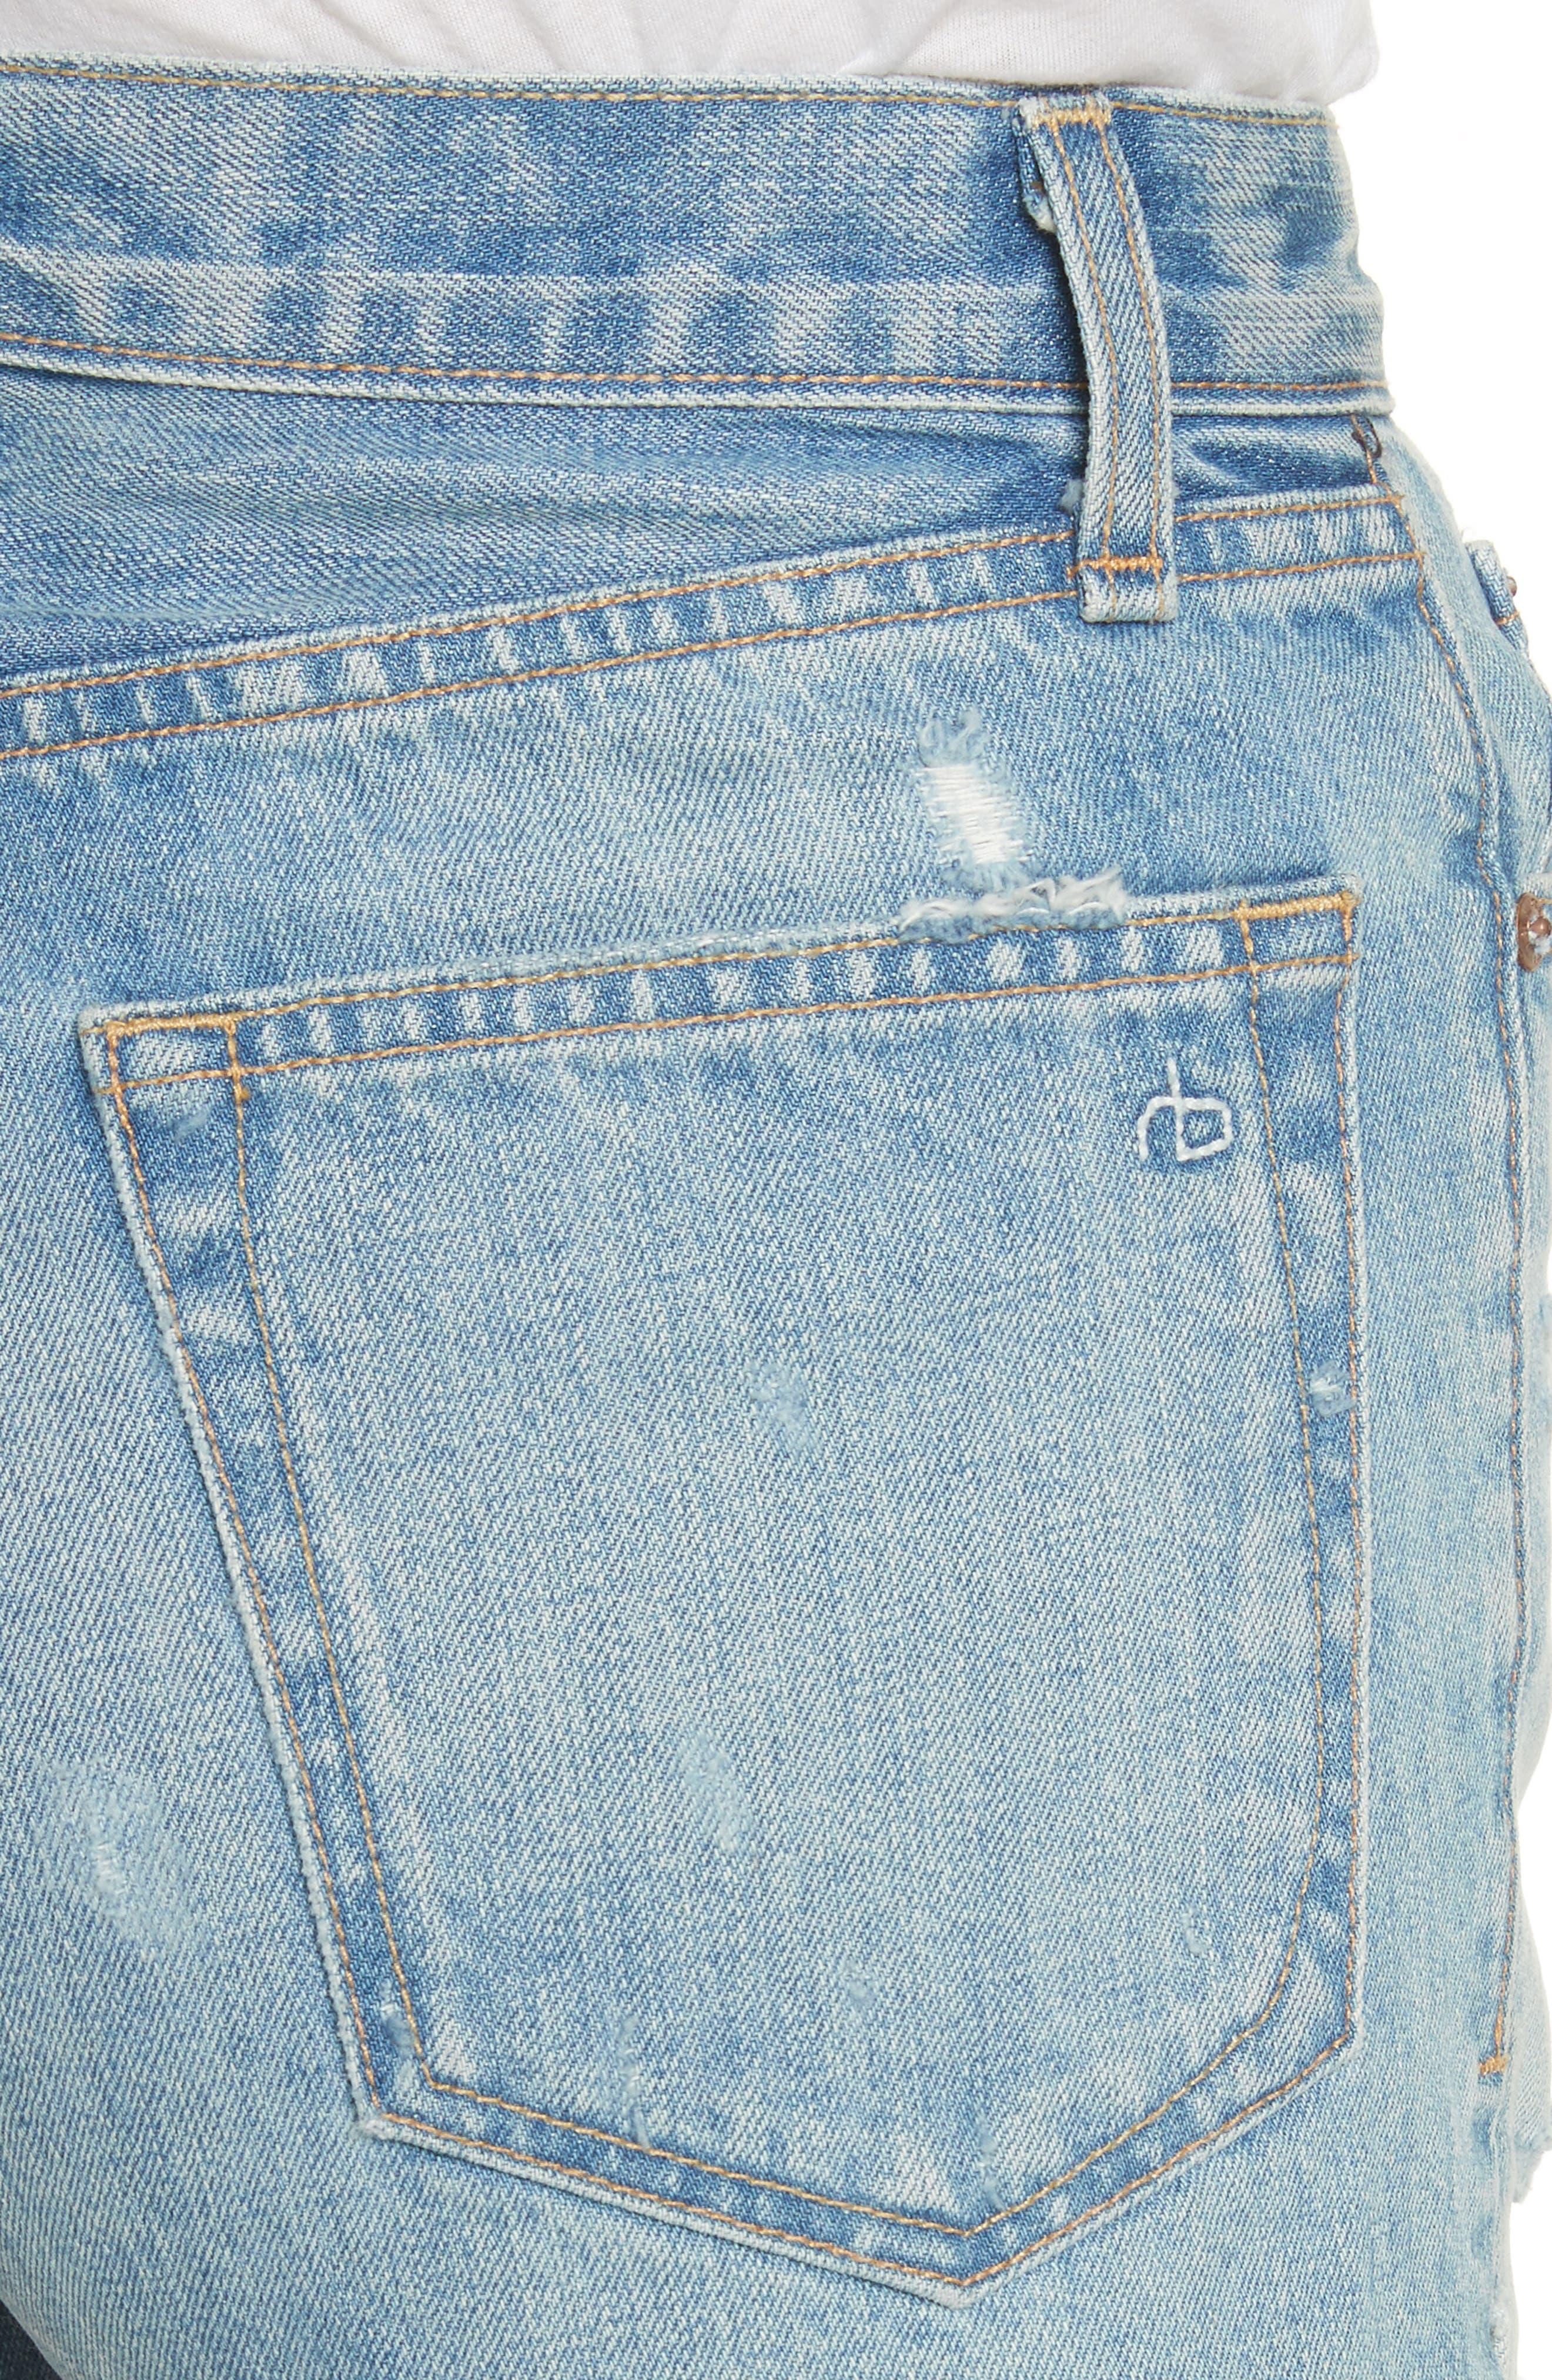 Justine High Waist Cutoff Denim Shorts,                             Alternate thumbnail 4, color,                             450